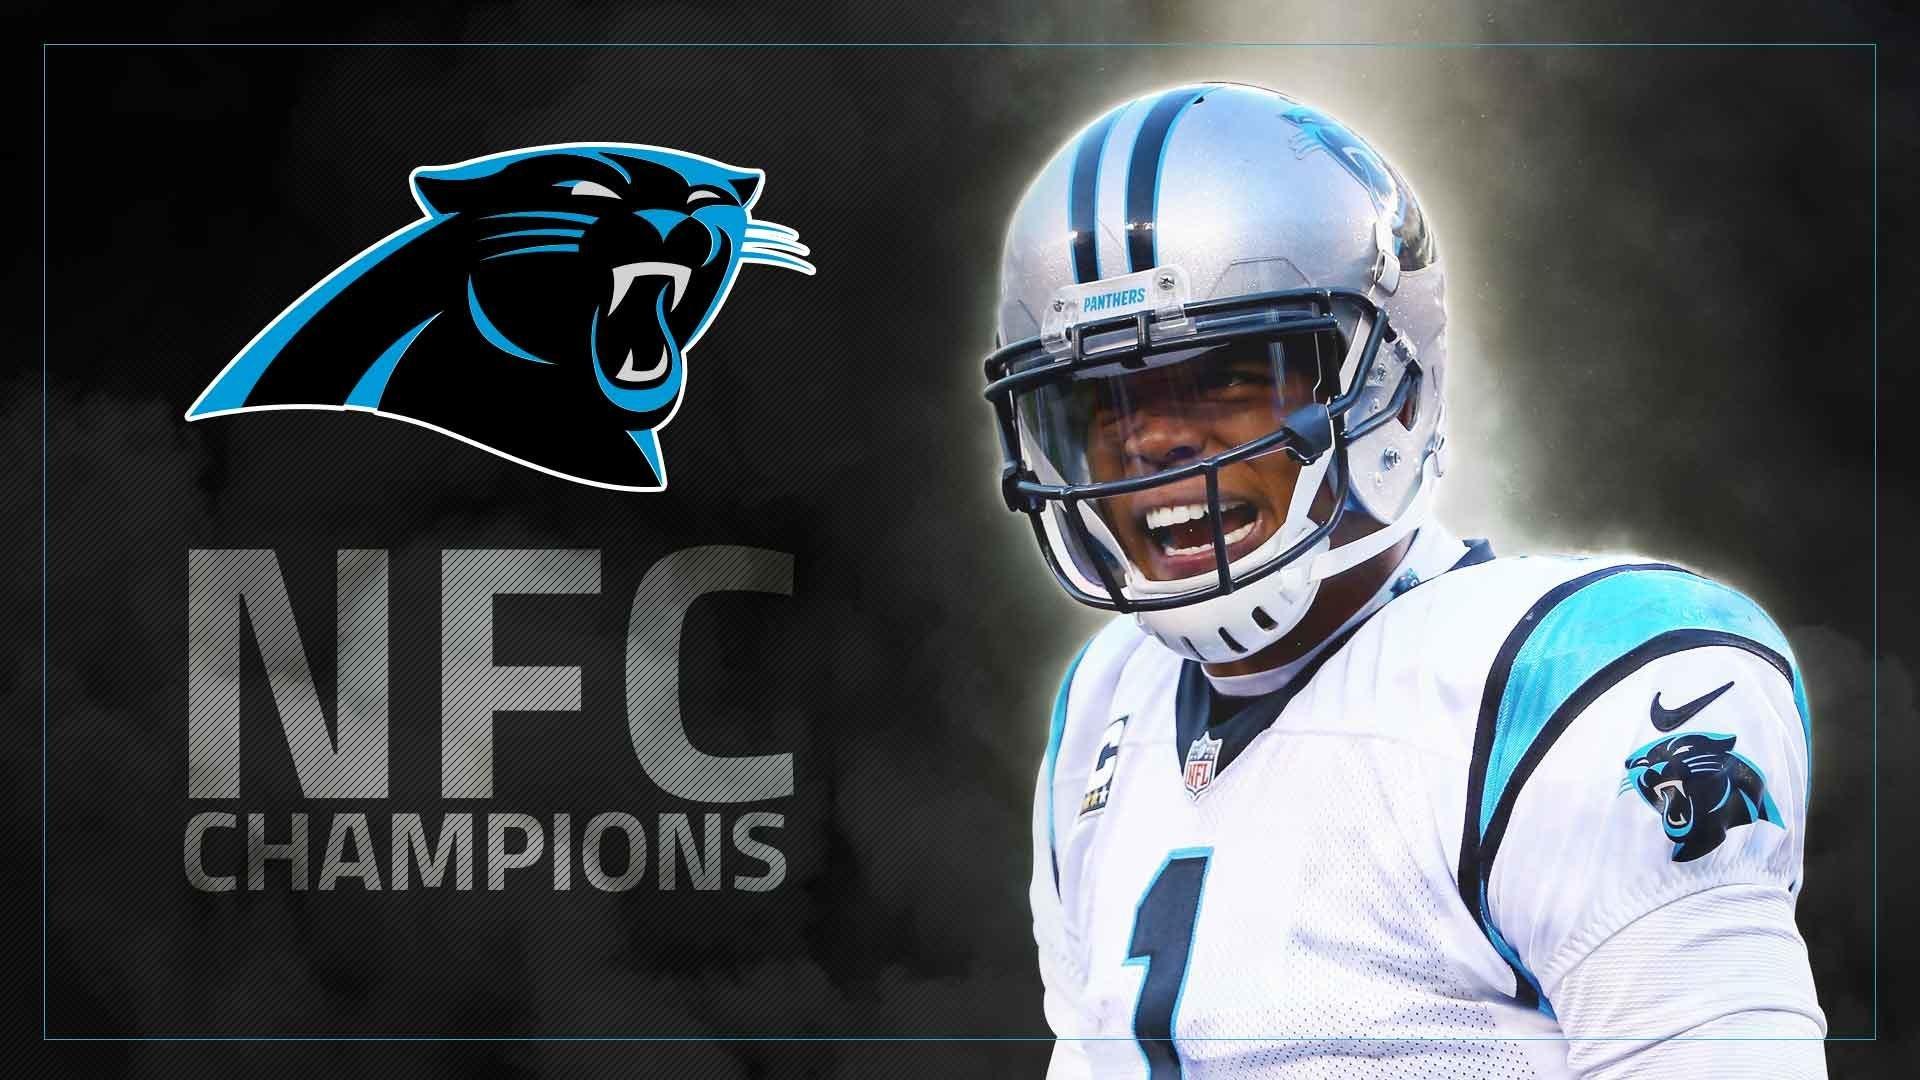 Carolina Panthers Wallpaper Background (70+ Images